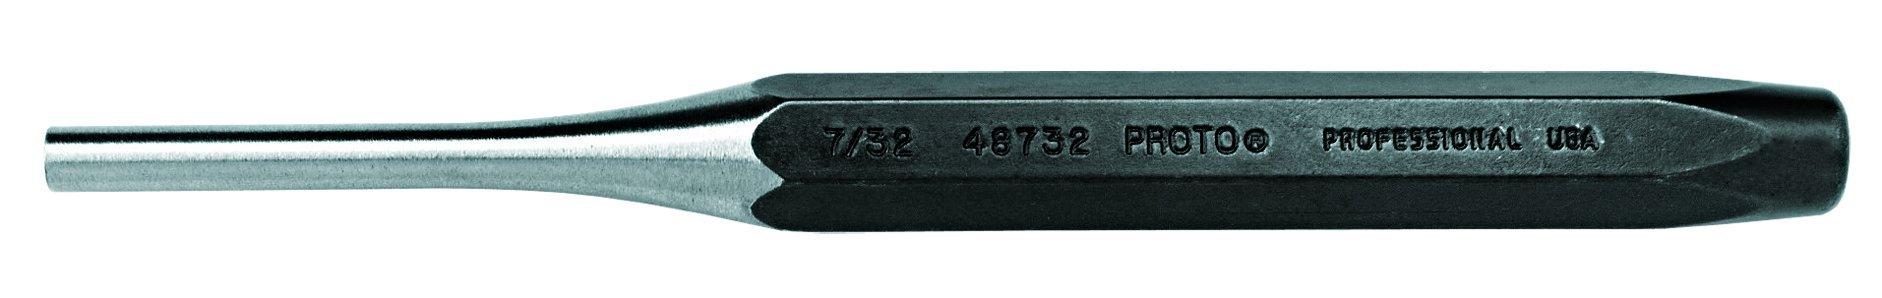 Stanley Proto J48516 5/16-Inch Super-Duty Punch Pin